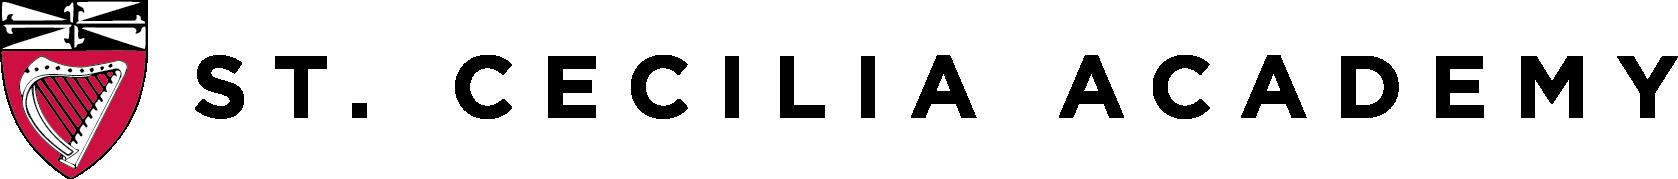 Stcecilia-logo